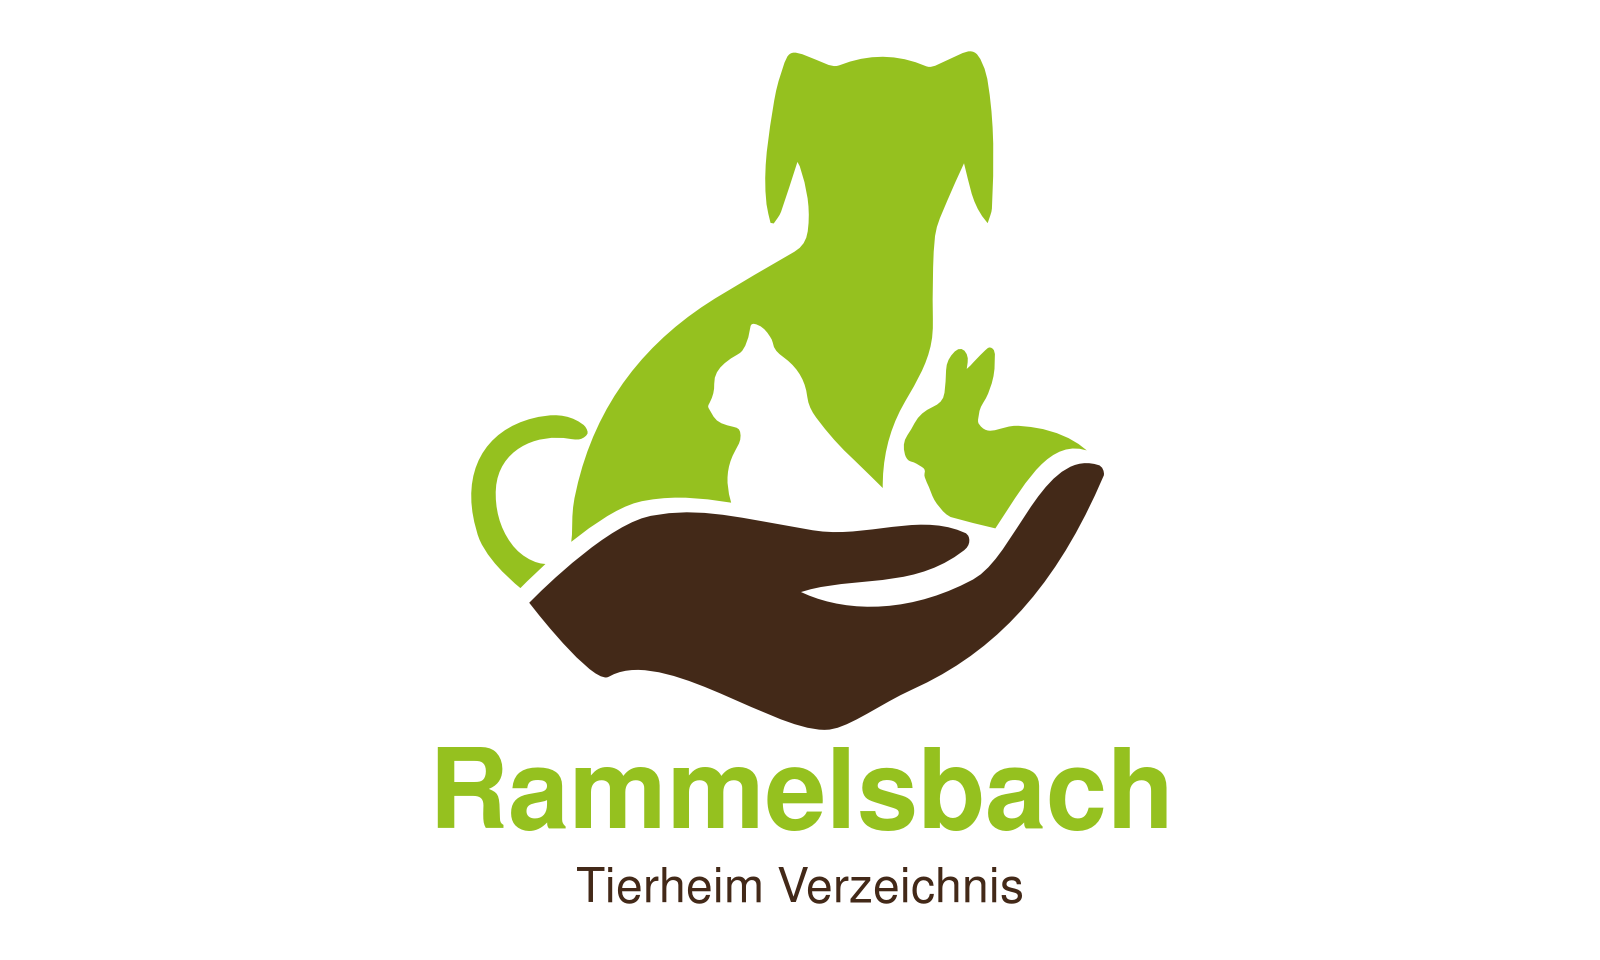 Tierheim Rammelsbach